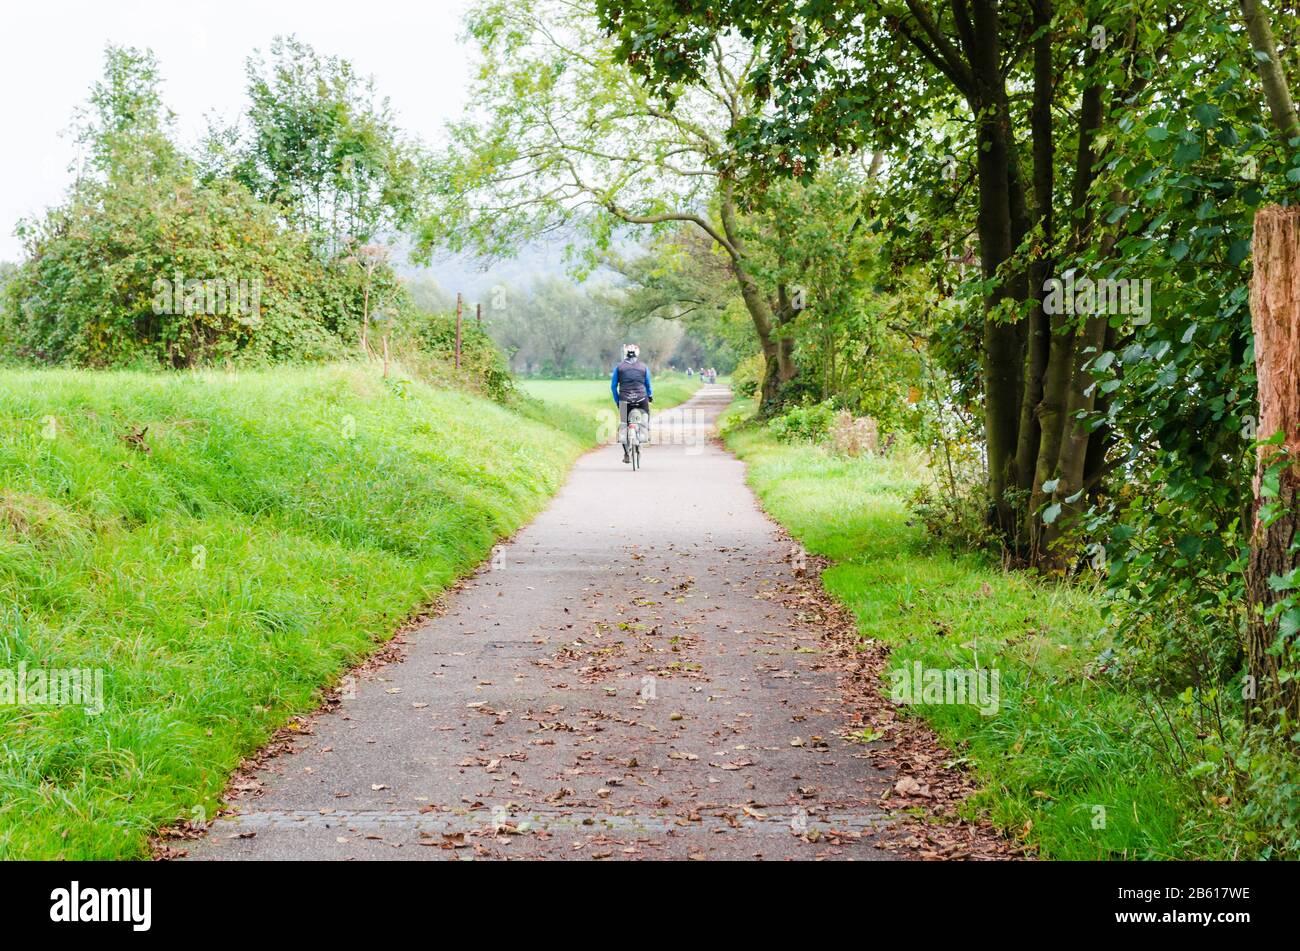 Essen, Germany - September 30, 2014: group of older men on the bike on the boardwalk of the river Ruhr near Essen Werden towards Kettwig. Stock Photo